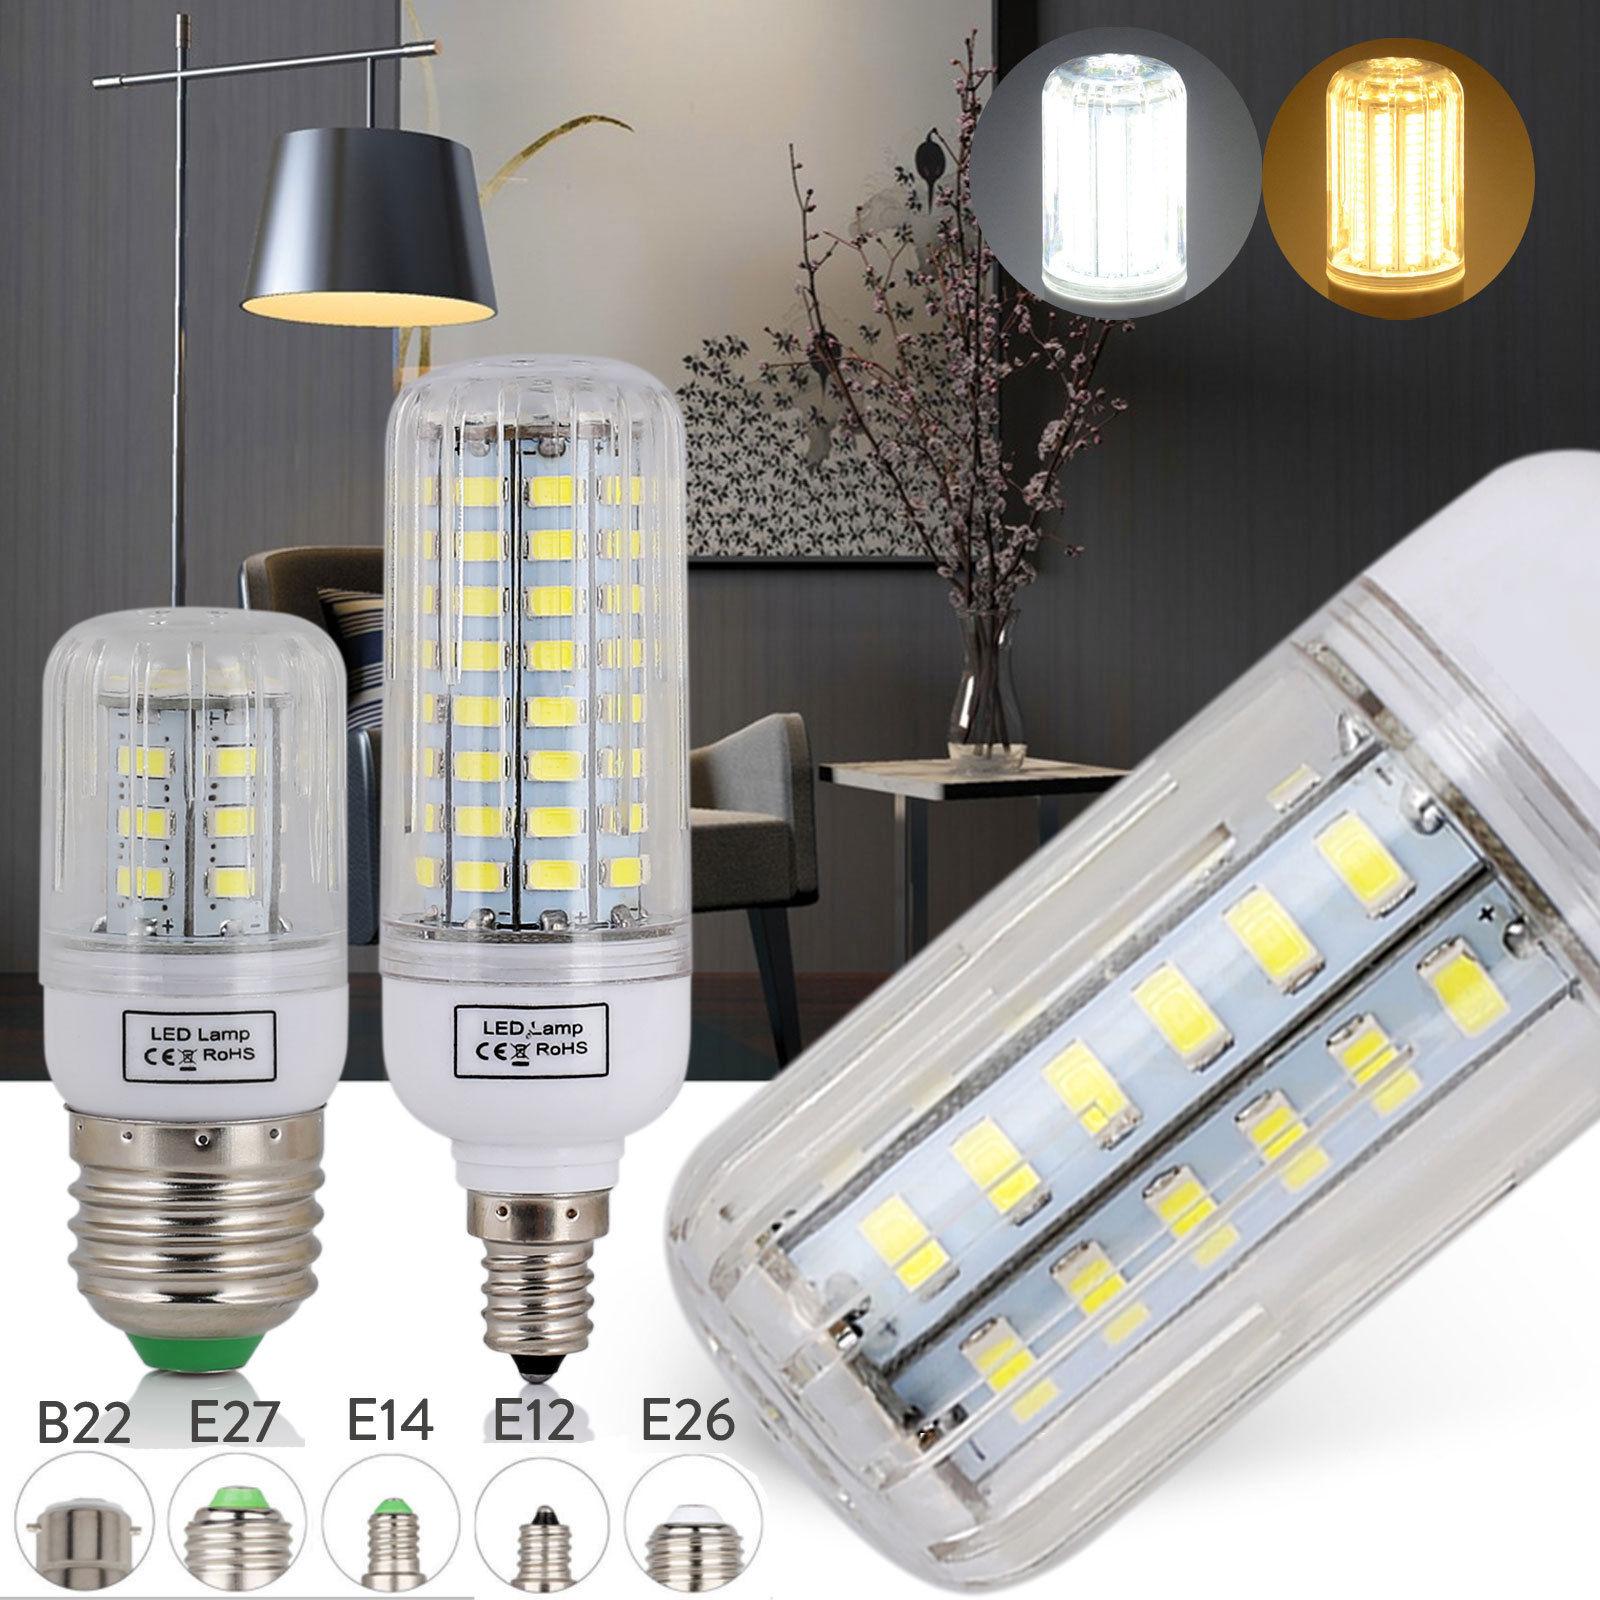 Light Bulbs Ultra Bright 5730 SMD LED Corn Bulb Lamp Cool